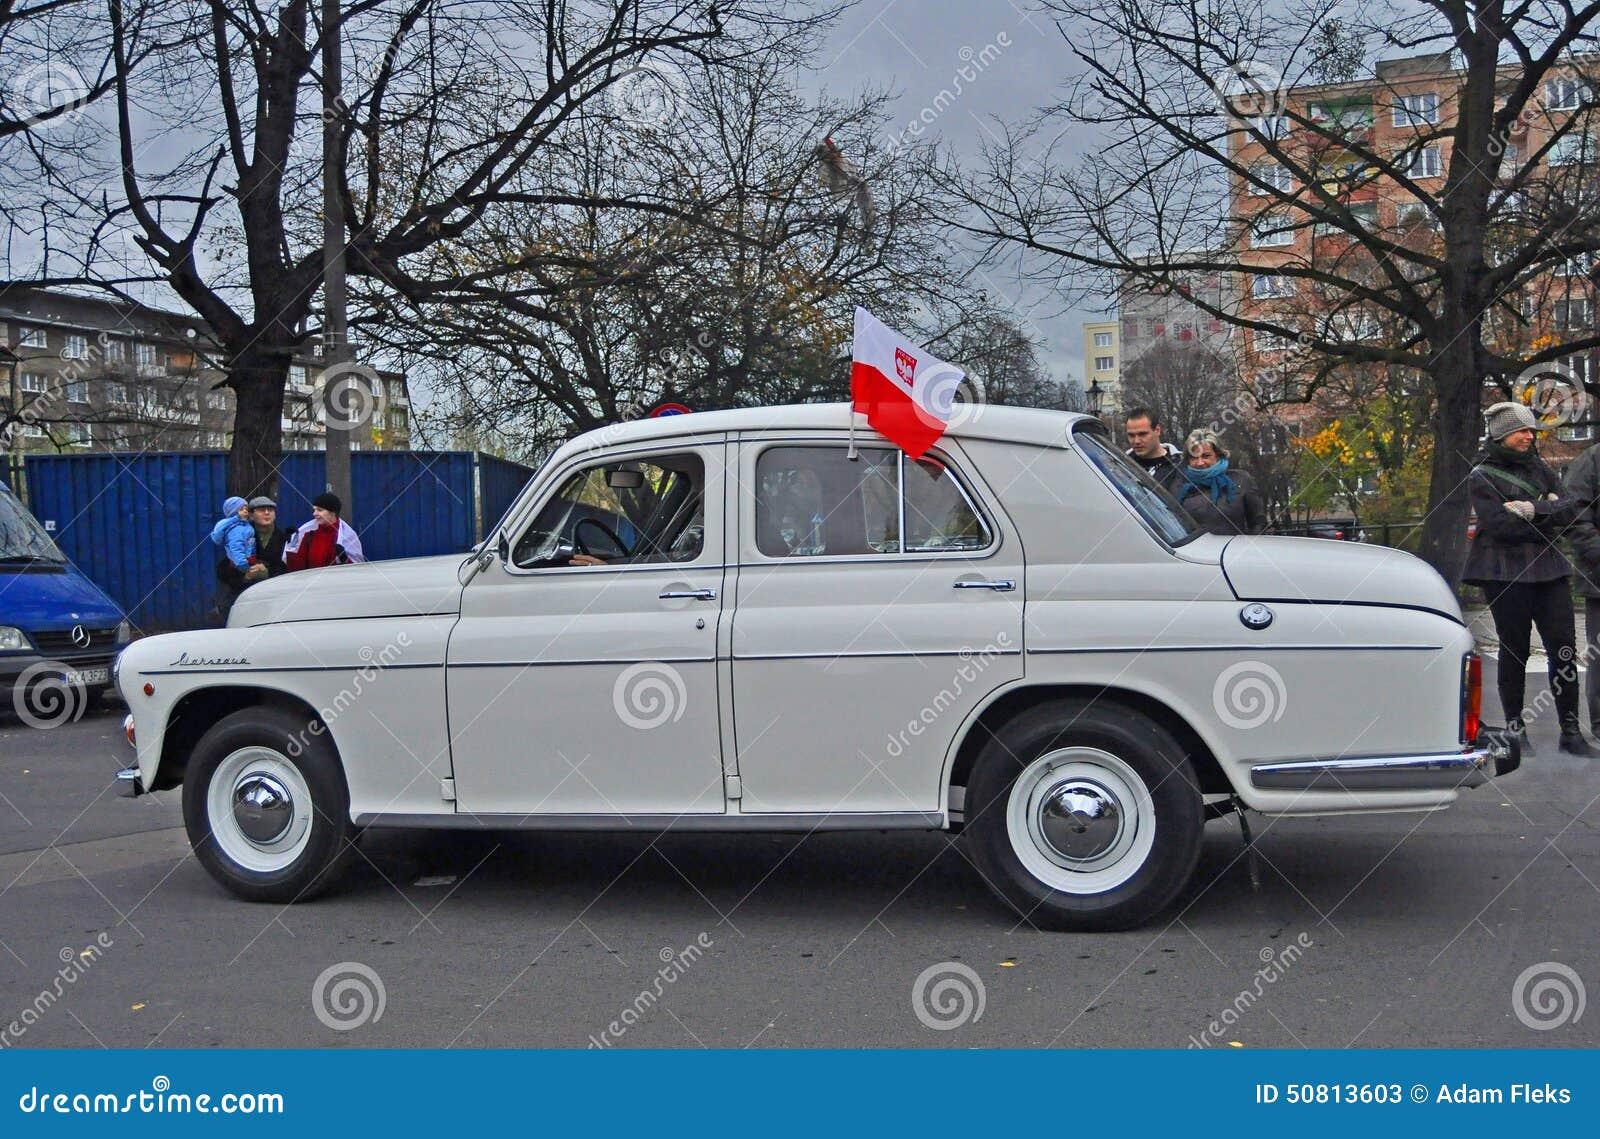 classic polish car editorial stock photo image of vehicle 50813603. Black Bedroom Furniture Sets. Home Design Ideas